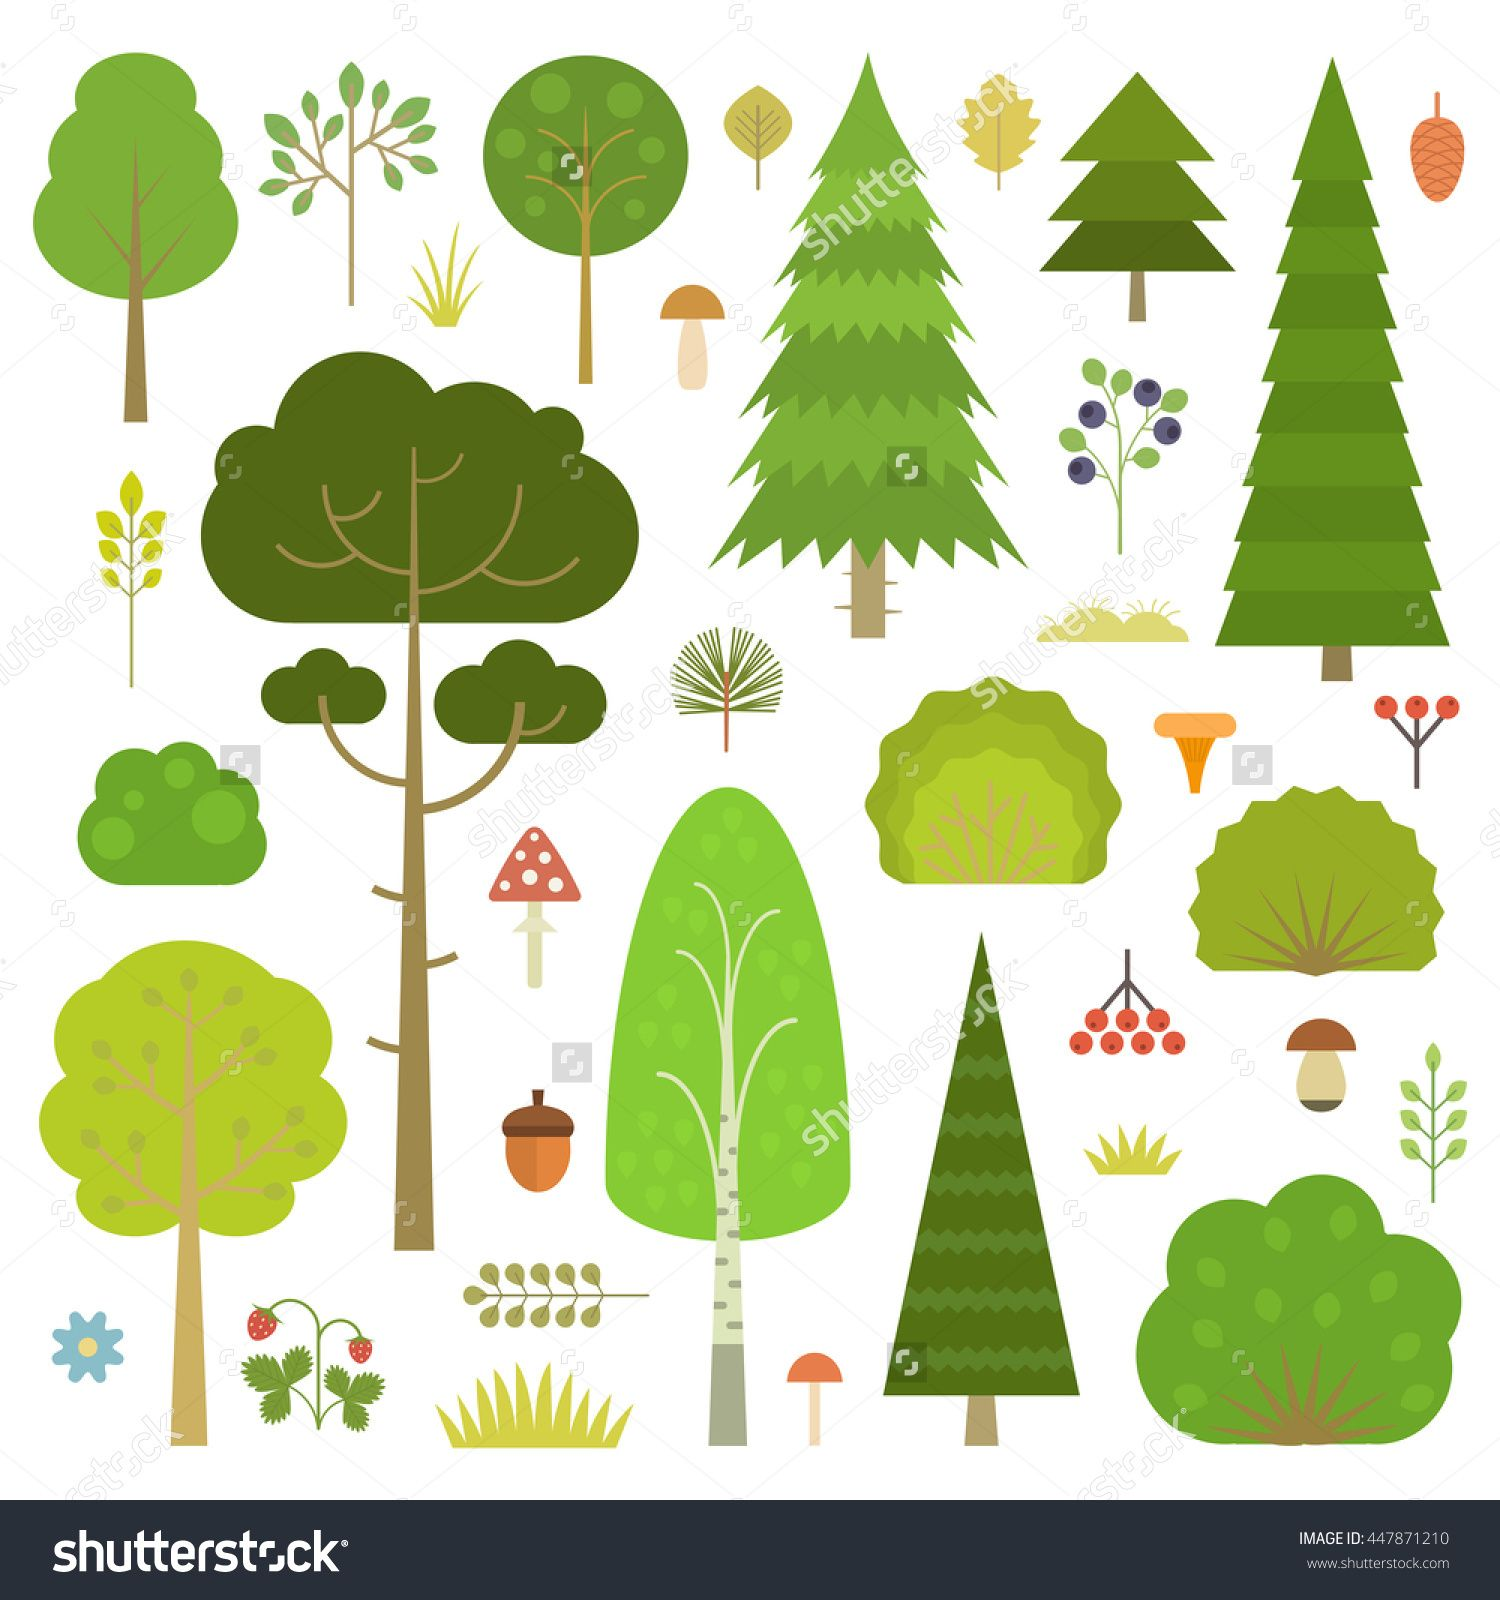 Bush clipart forest. Set of flat vector